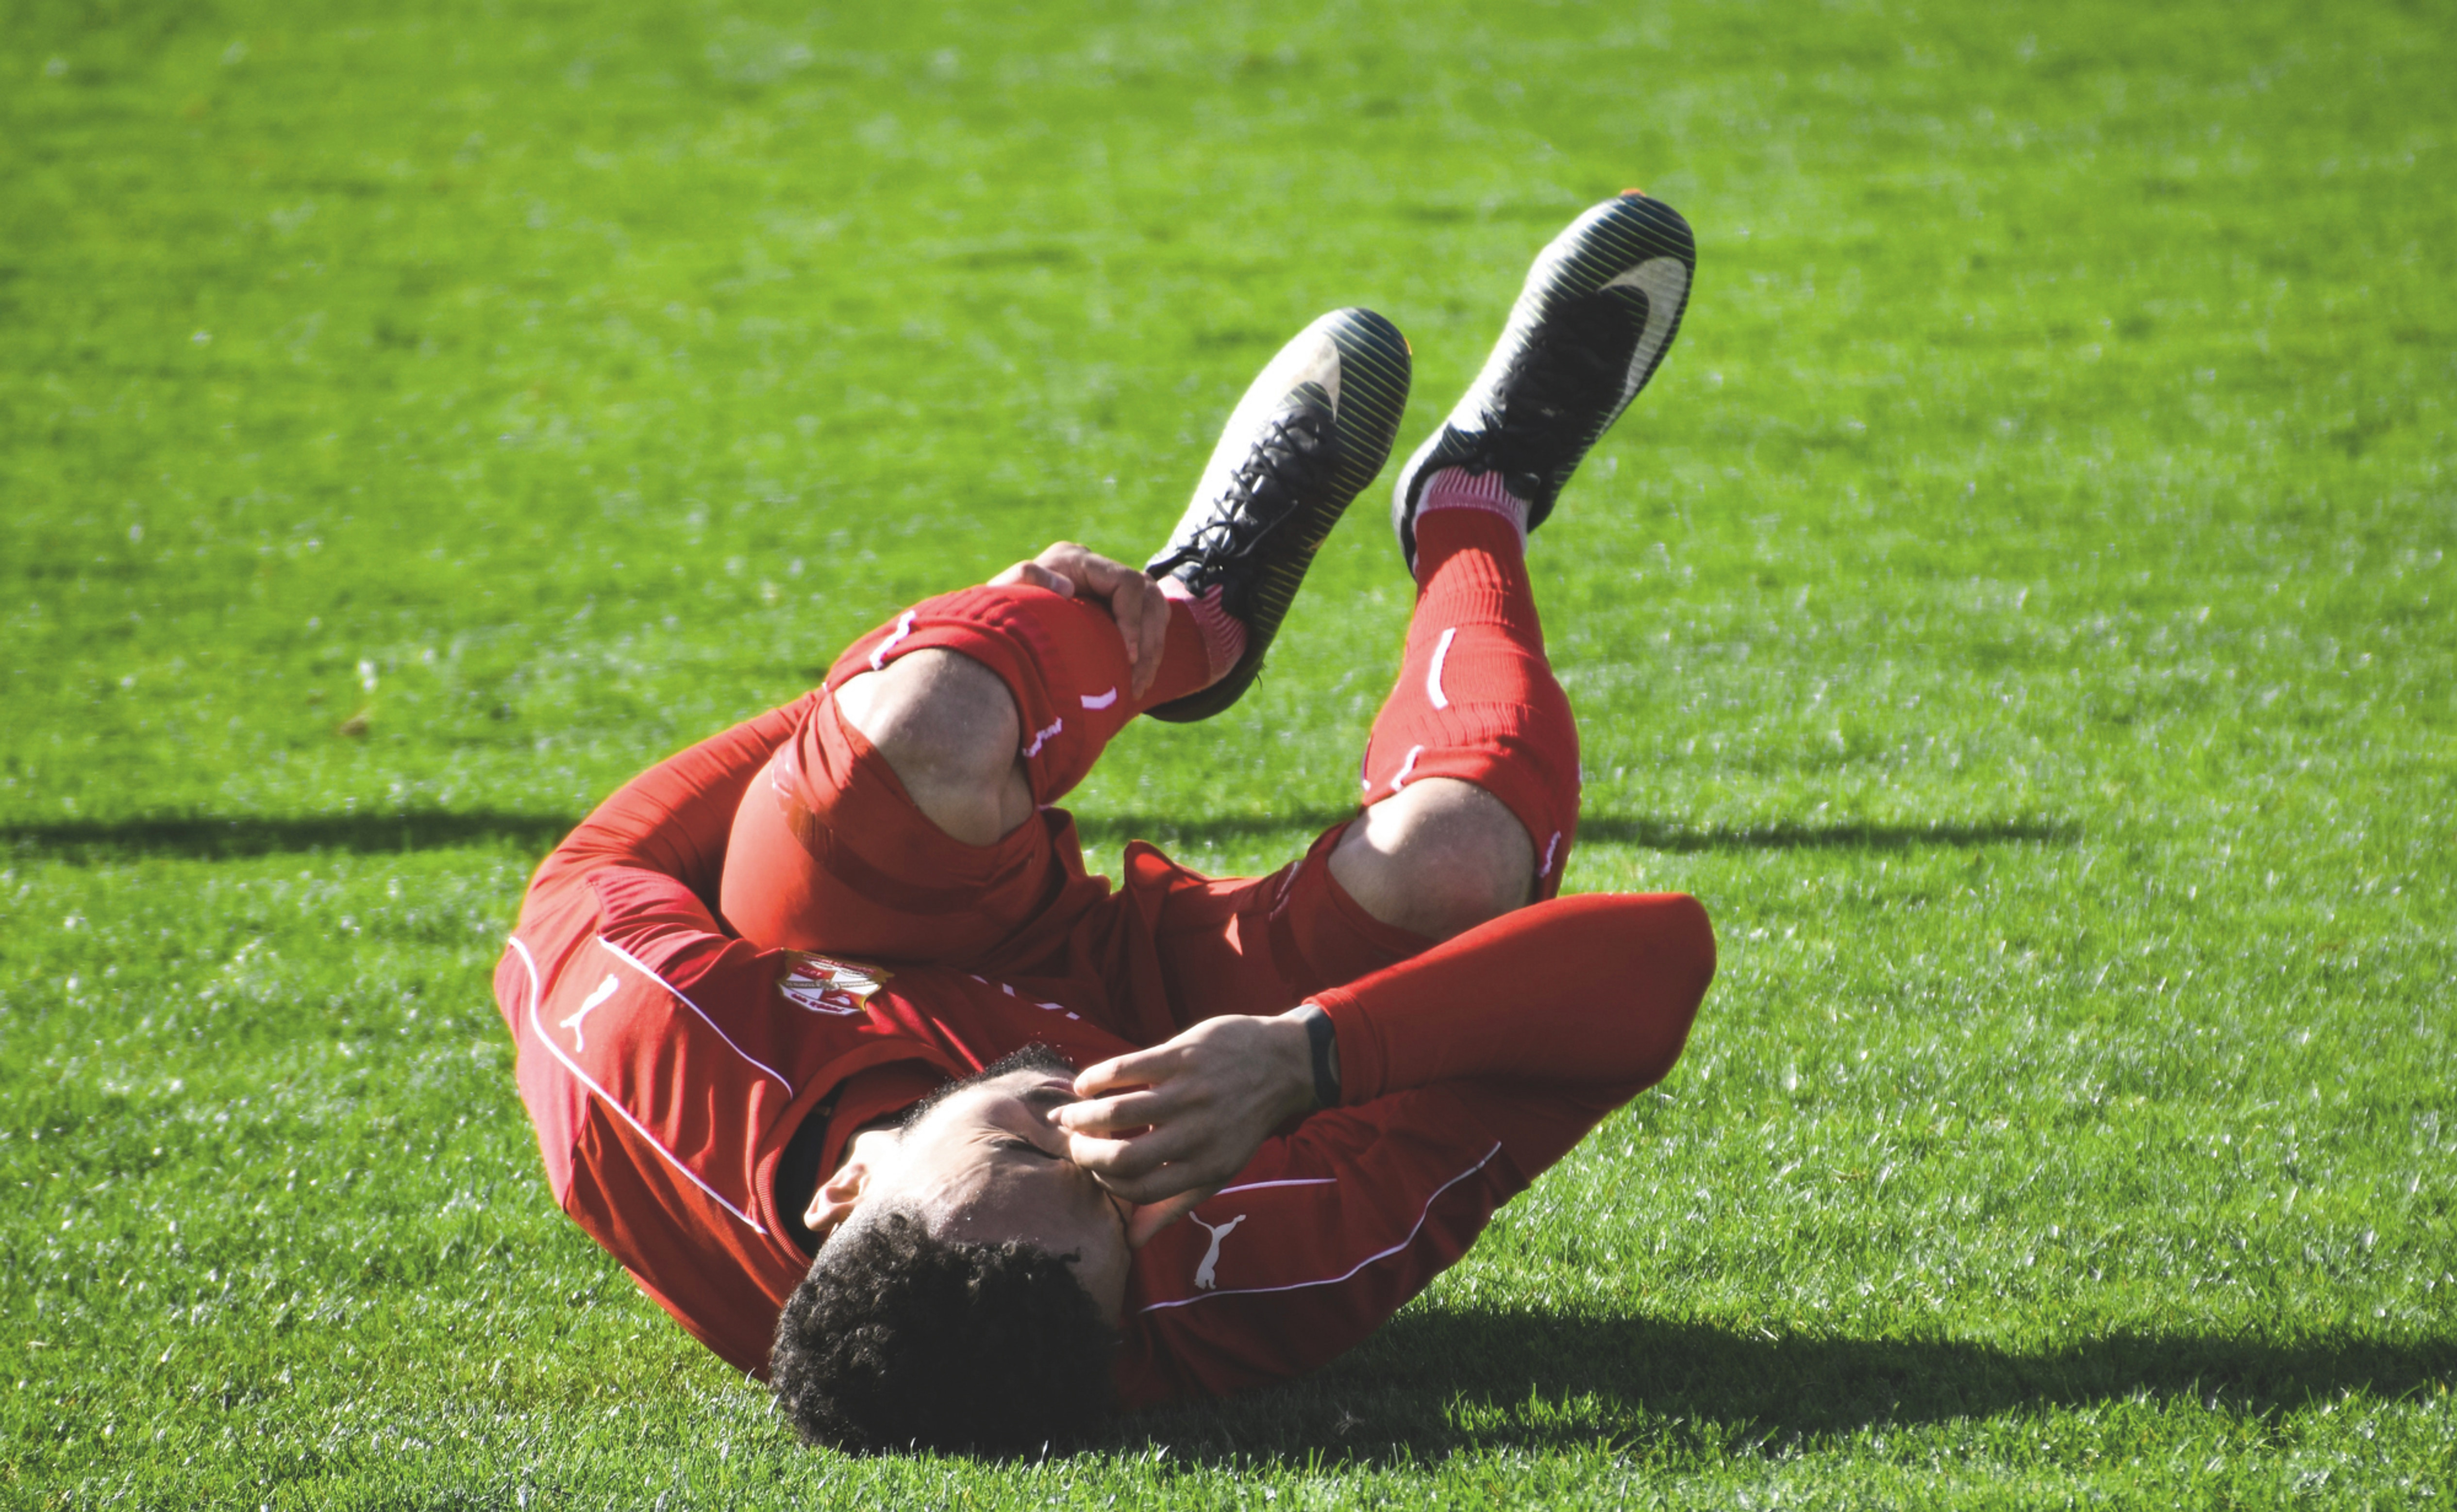 Injury Reduction Program